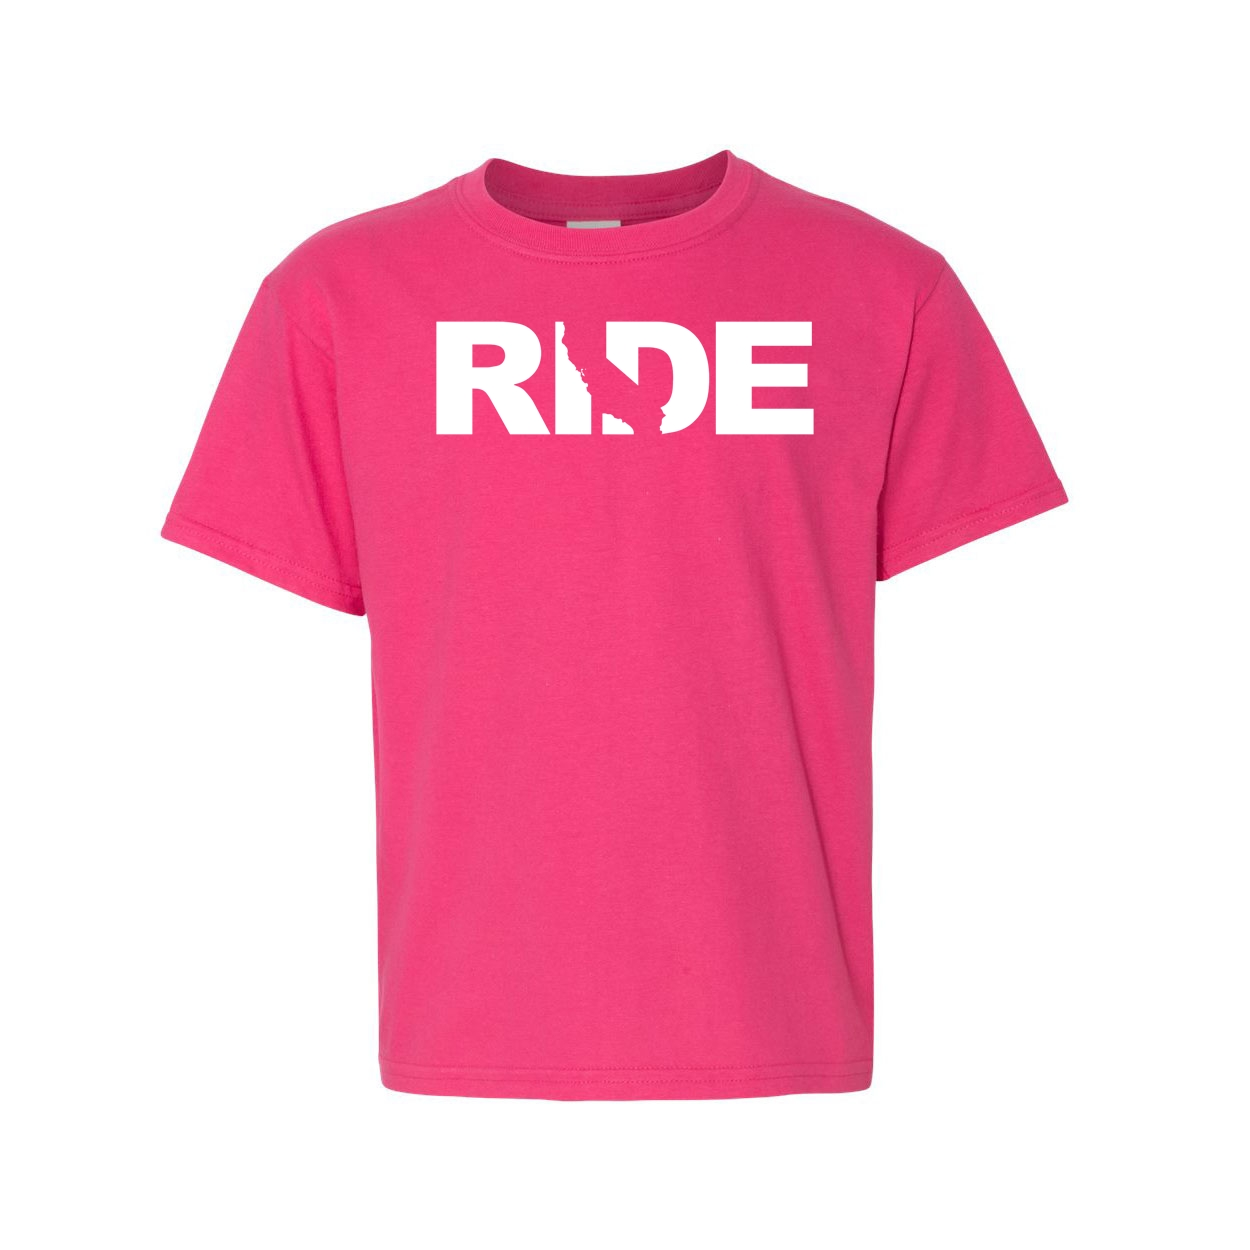 Ride California Classic Youth T-Shirt Pink (White Logo)